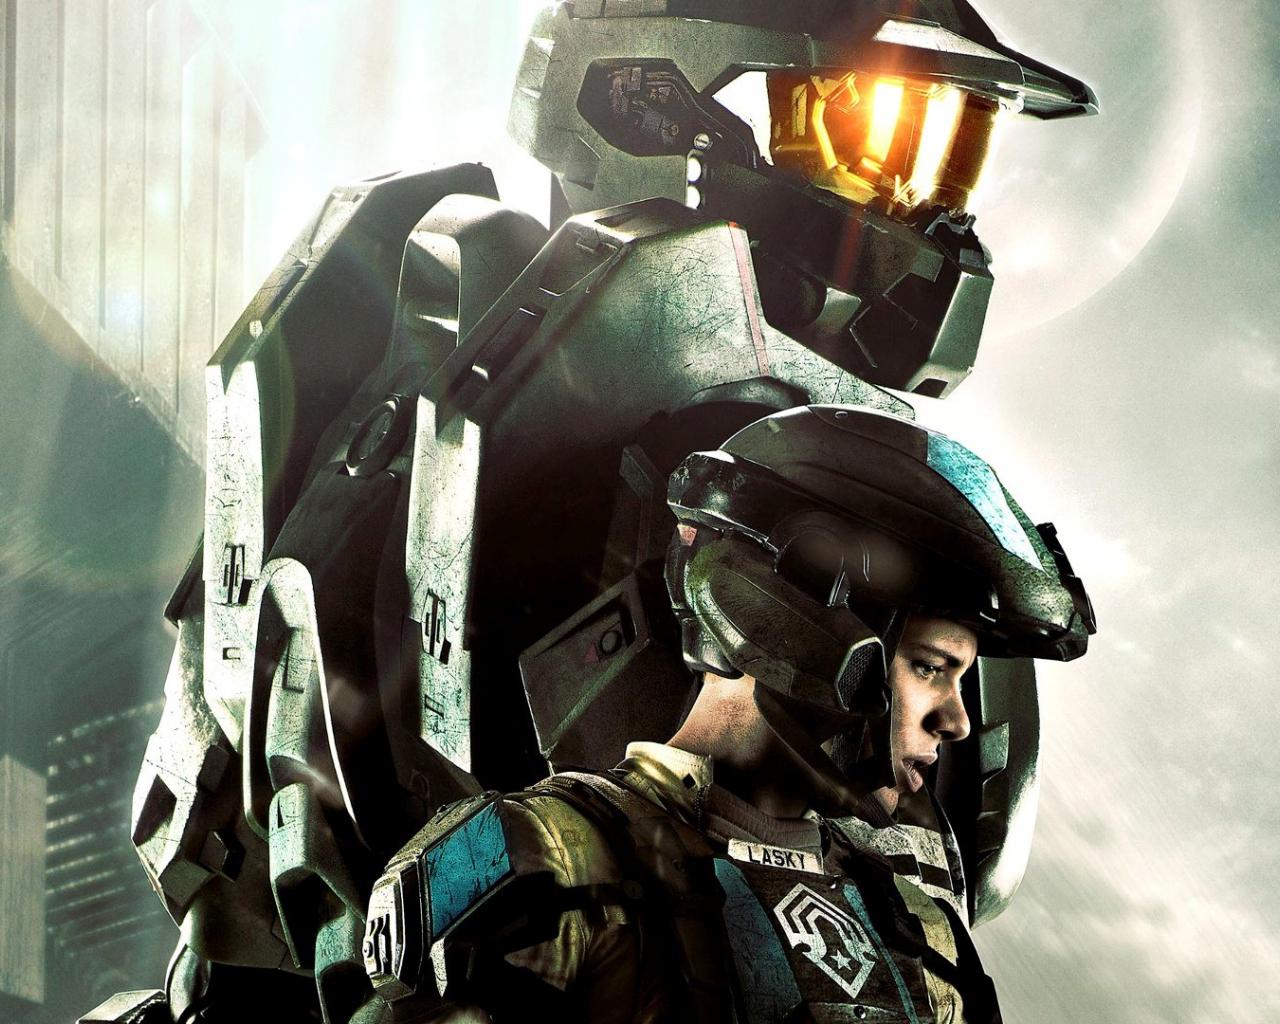 Free Download Halo 4 Forward Unto Dawn Hd Wallpaper Background